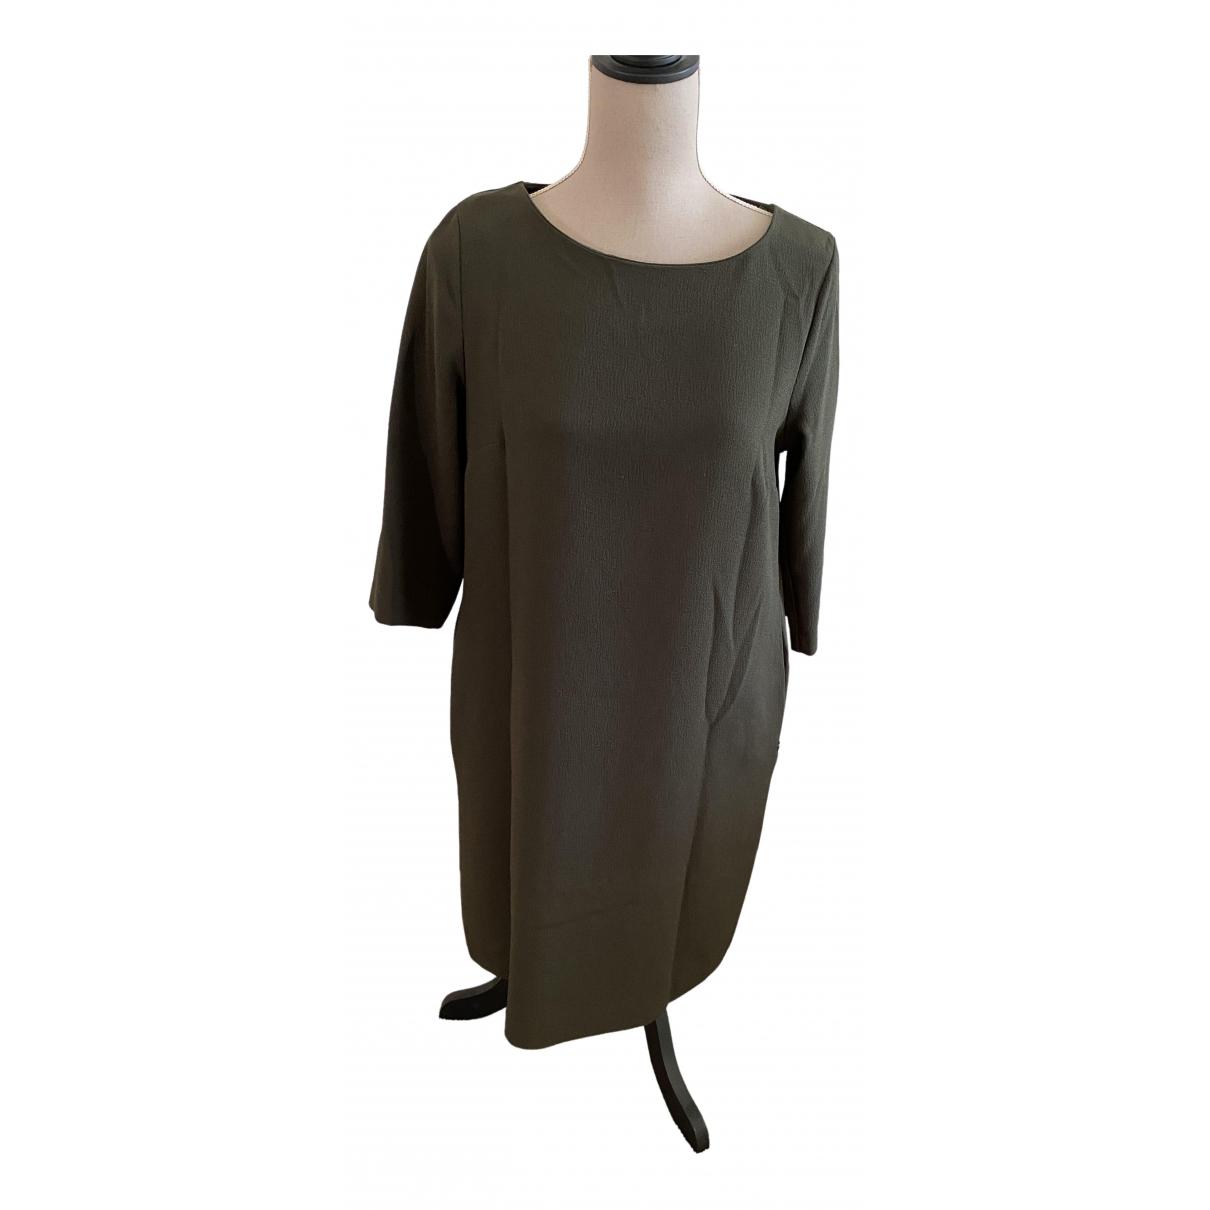 Ottodame \N Kleid in  Khaki Polyester